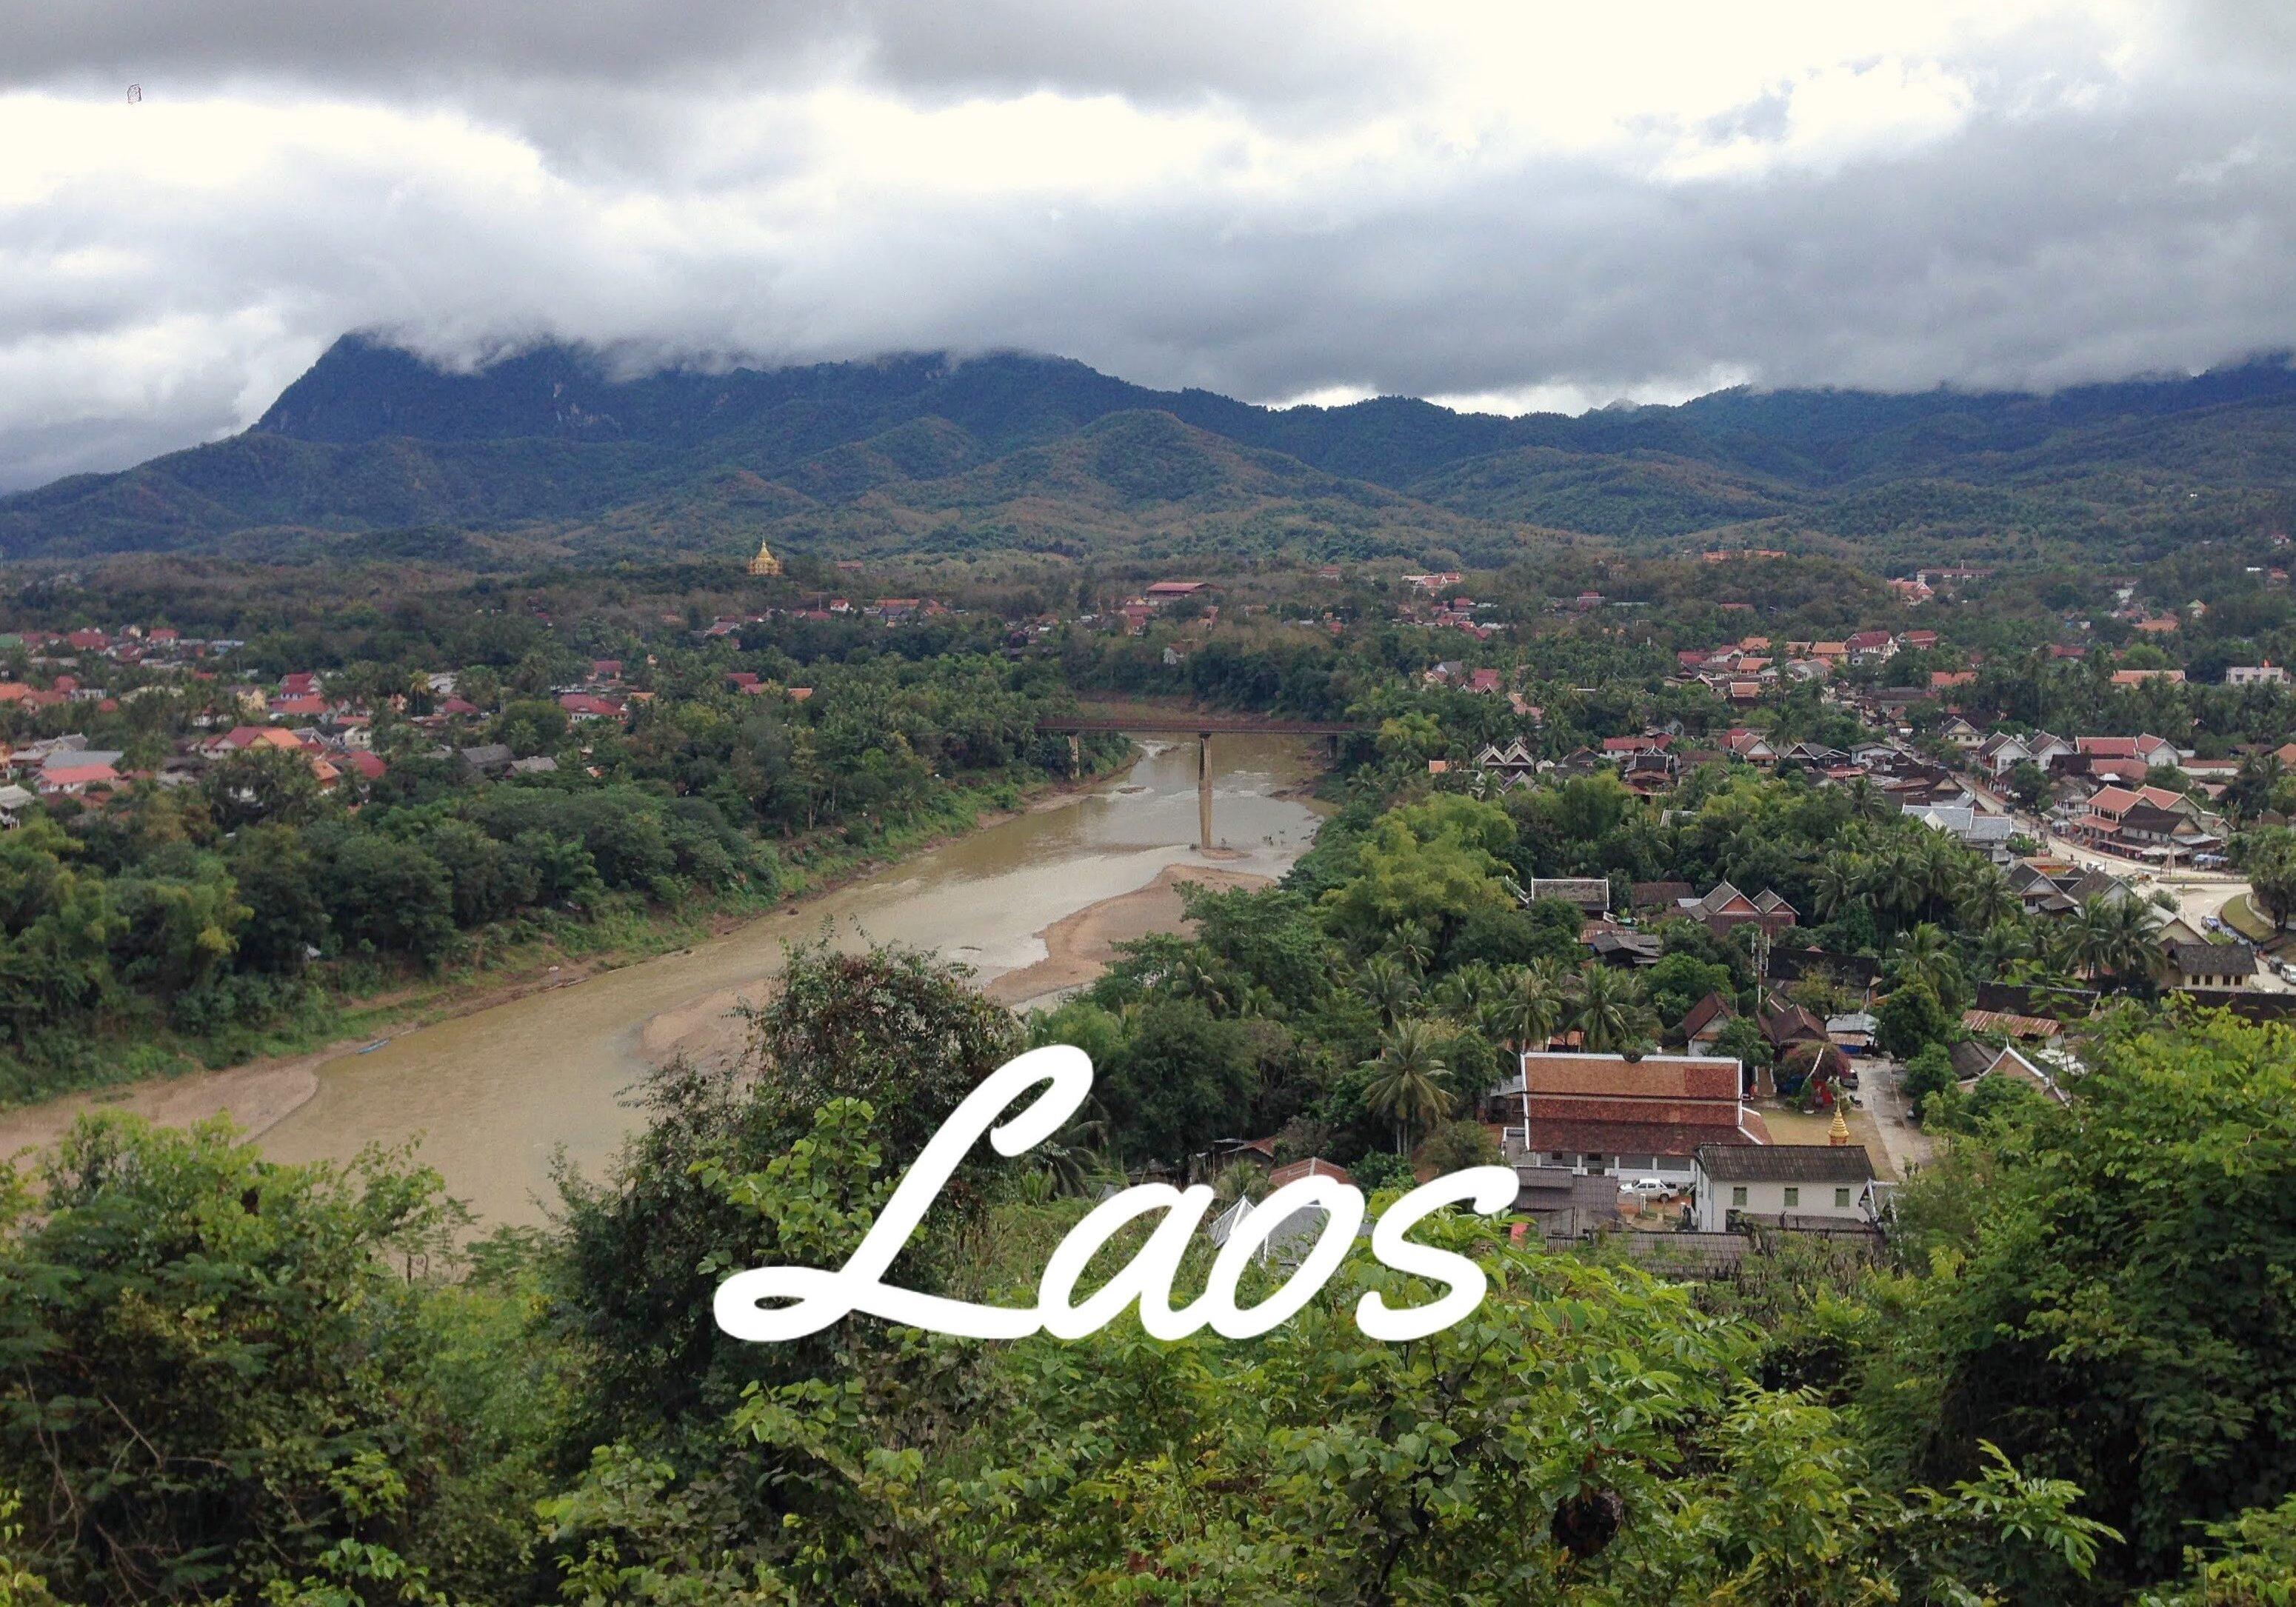 Laos, wanderdaze, blog, travelling, travel blog,